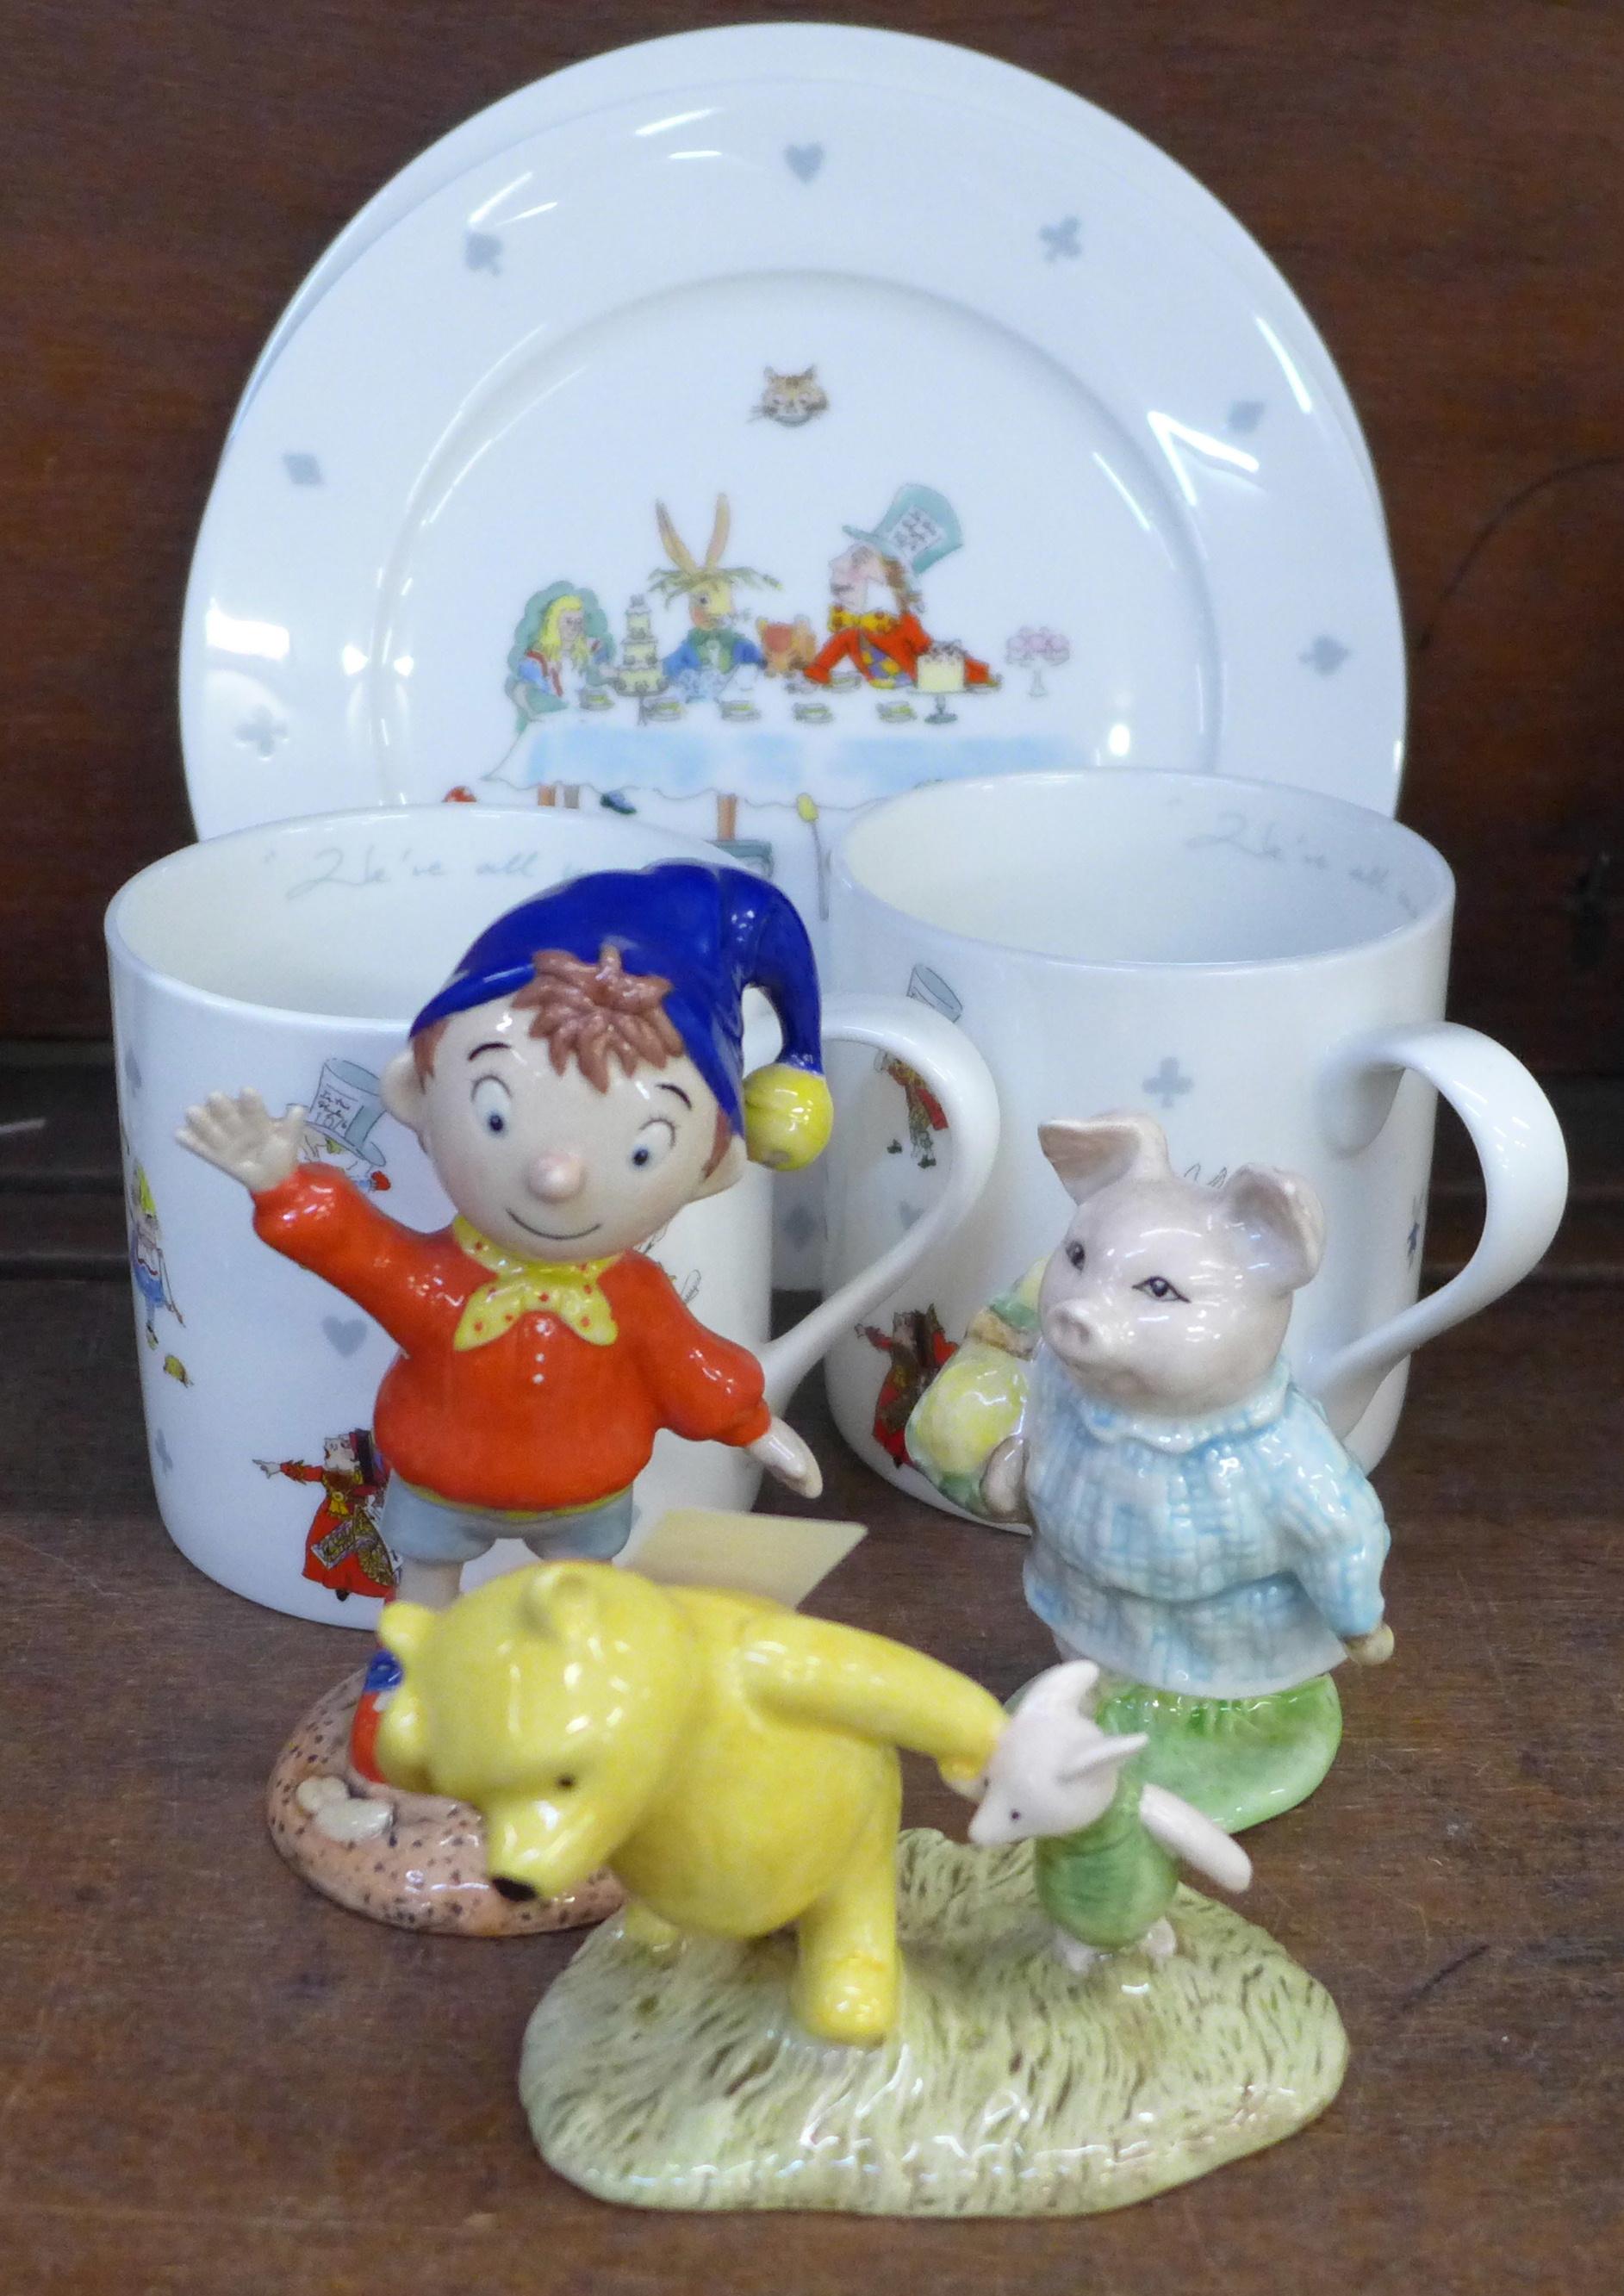 A Royal Worcester figure, Noddy, a Royal Doulton Winnie the Pooh figure, a Beswick Beatrix Potter